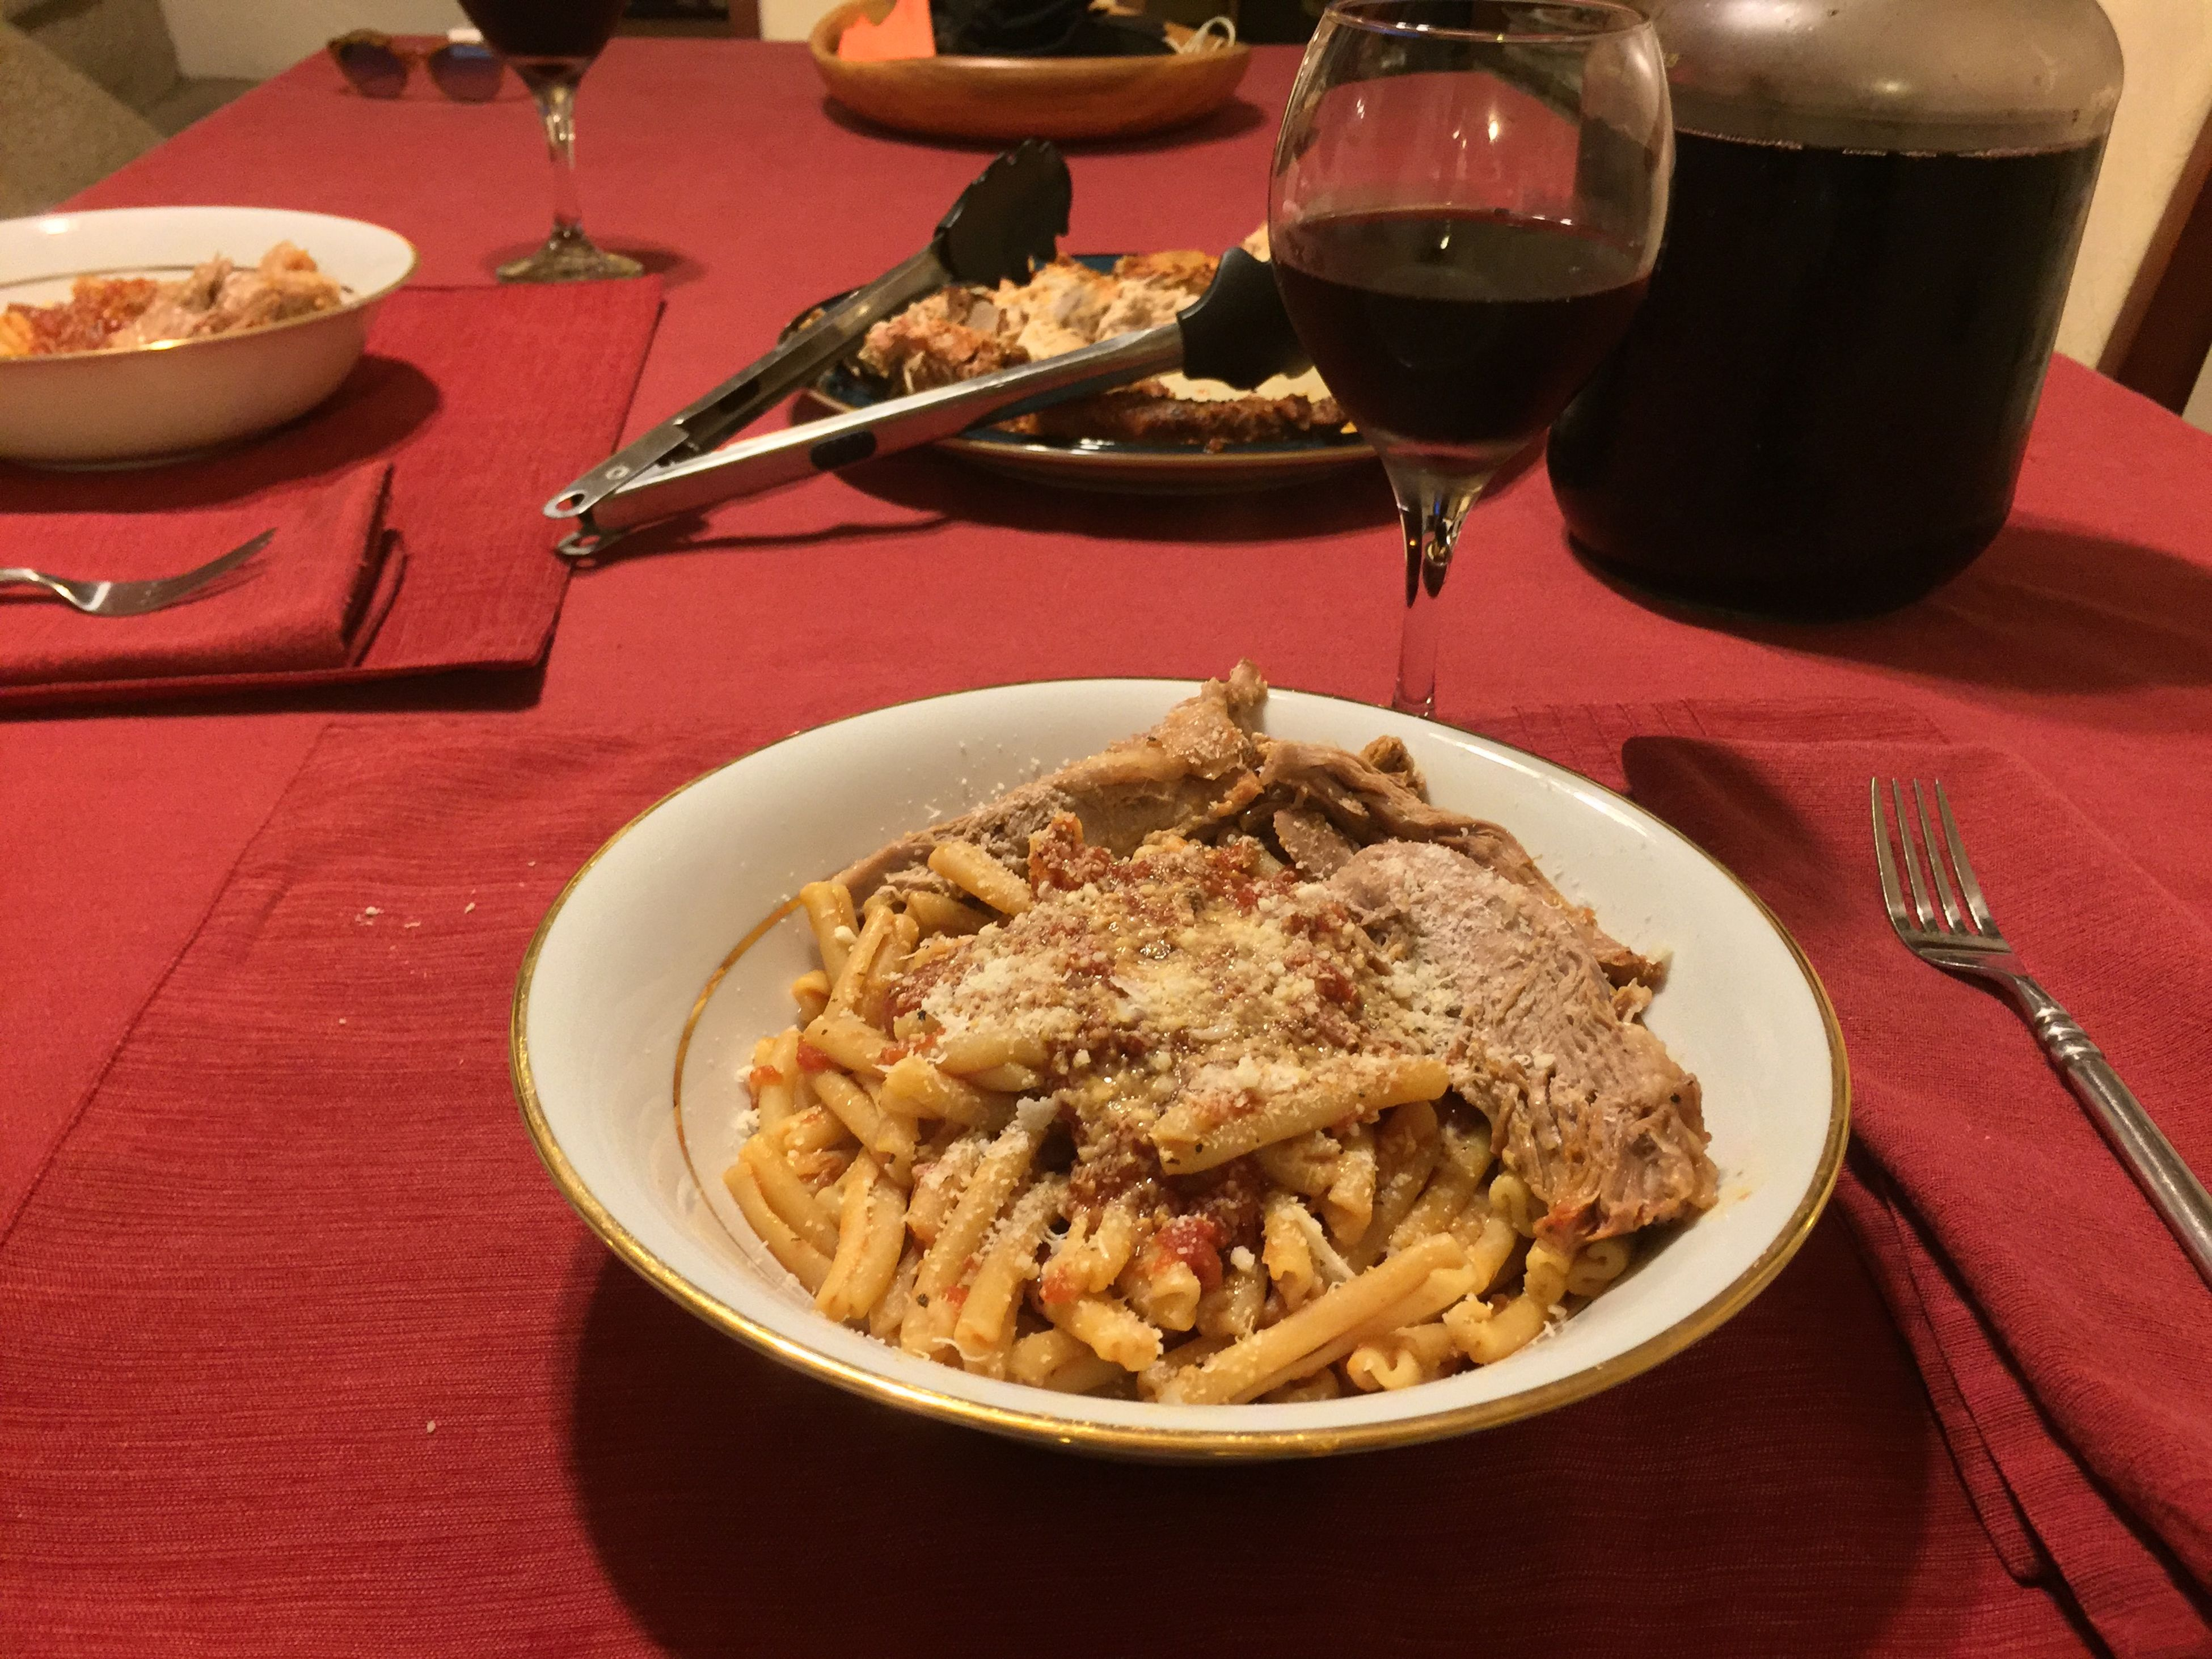 Tonight I made casarecce pasta with a pork roast. Served with my homemade 2014 Italian Barolo wine. ICanCookMyAssOff ItsAnItalianThing Gravy Pasta HomemadeItalianWine Nomnombomb Food Porn Awards MyFoodPics Food Porn